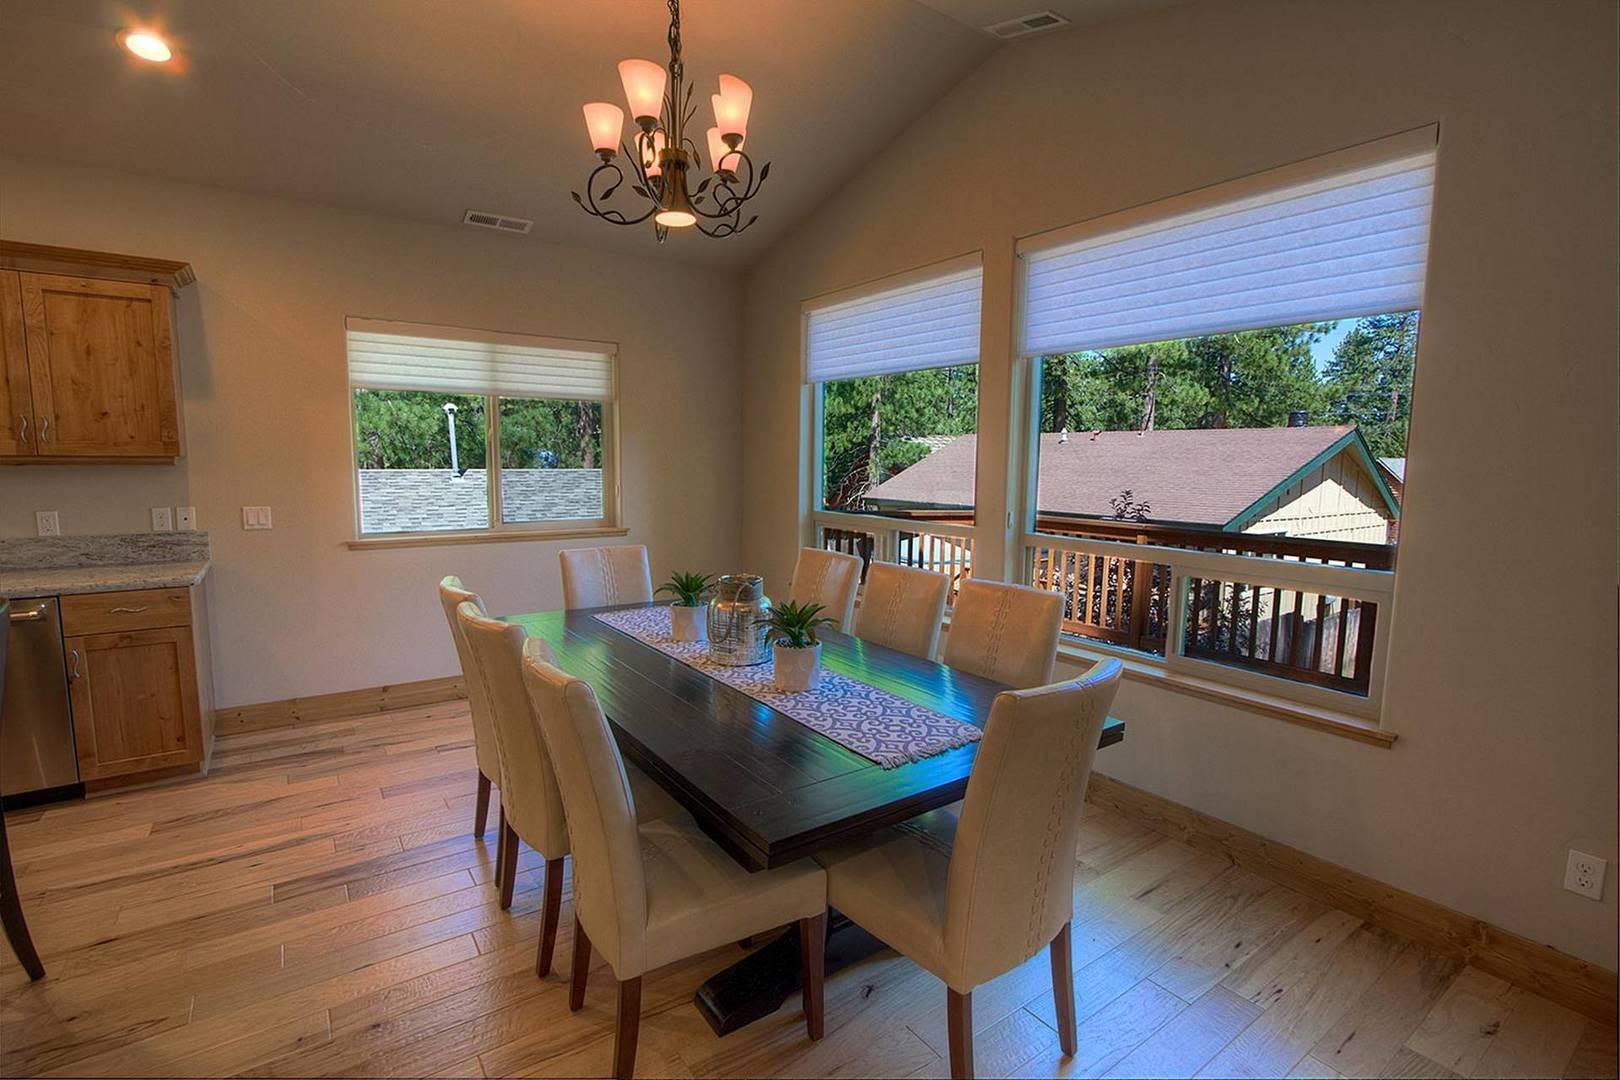 cyh1065 dining room